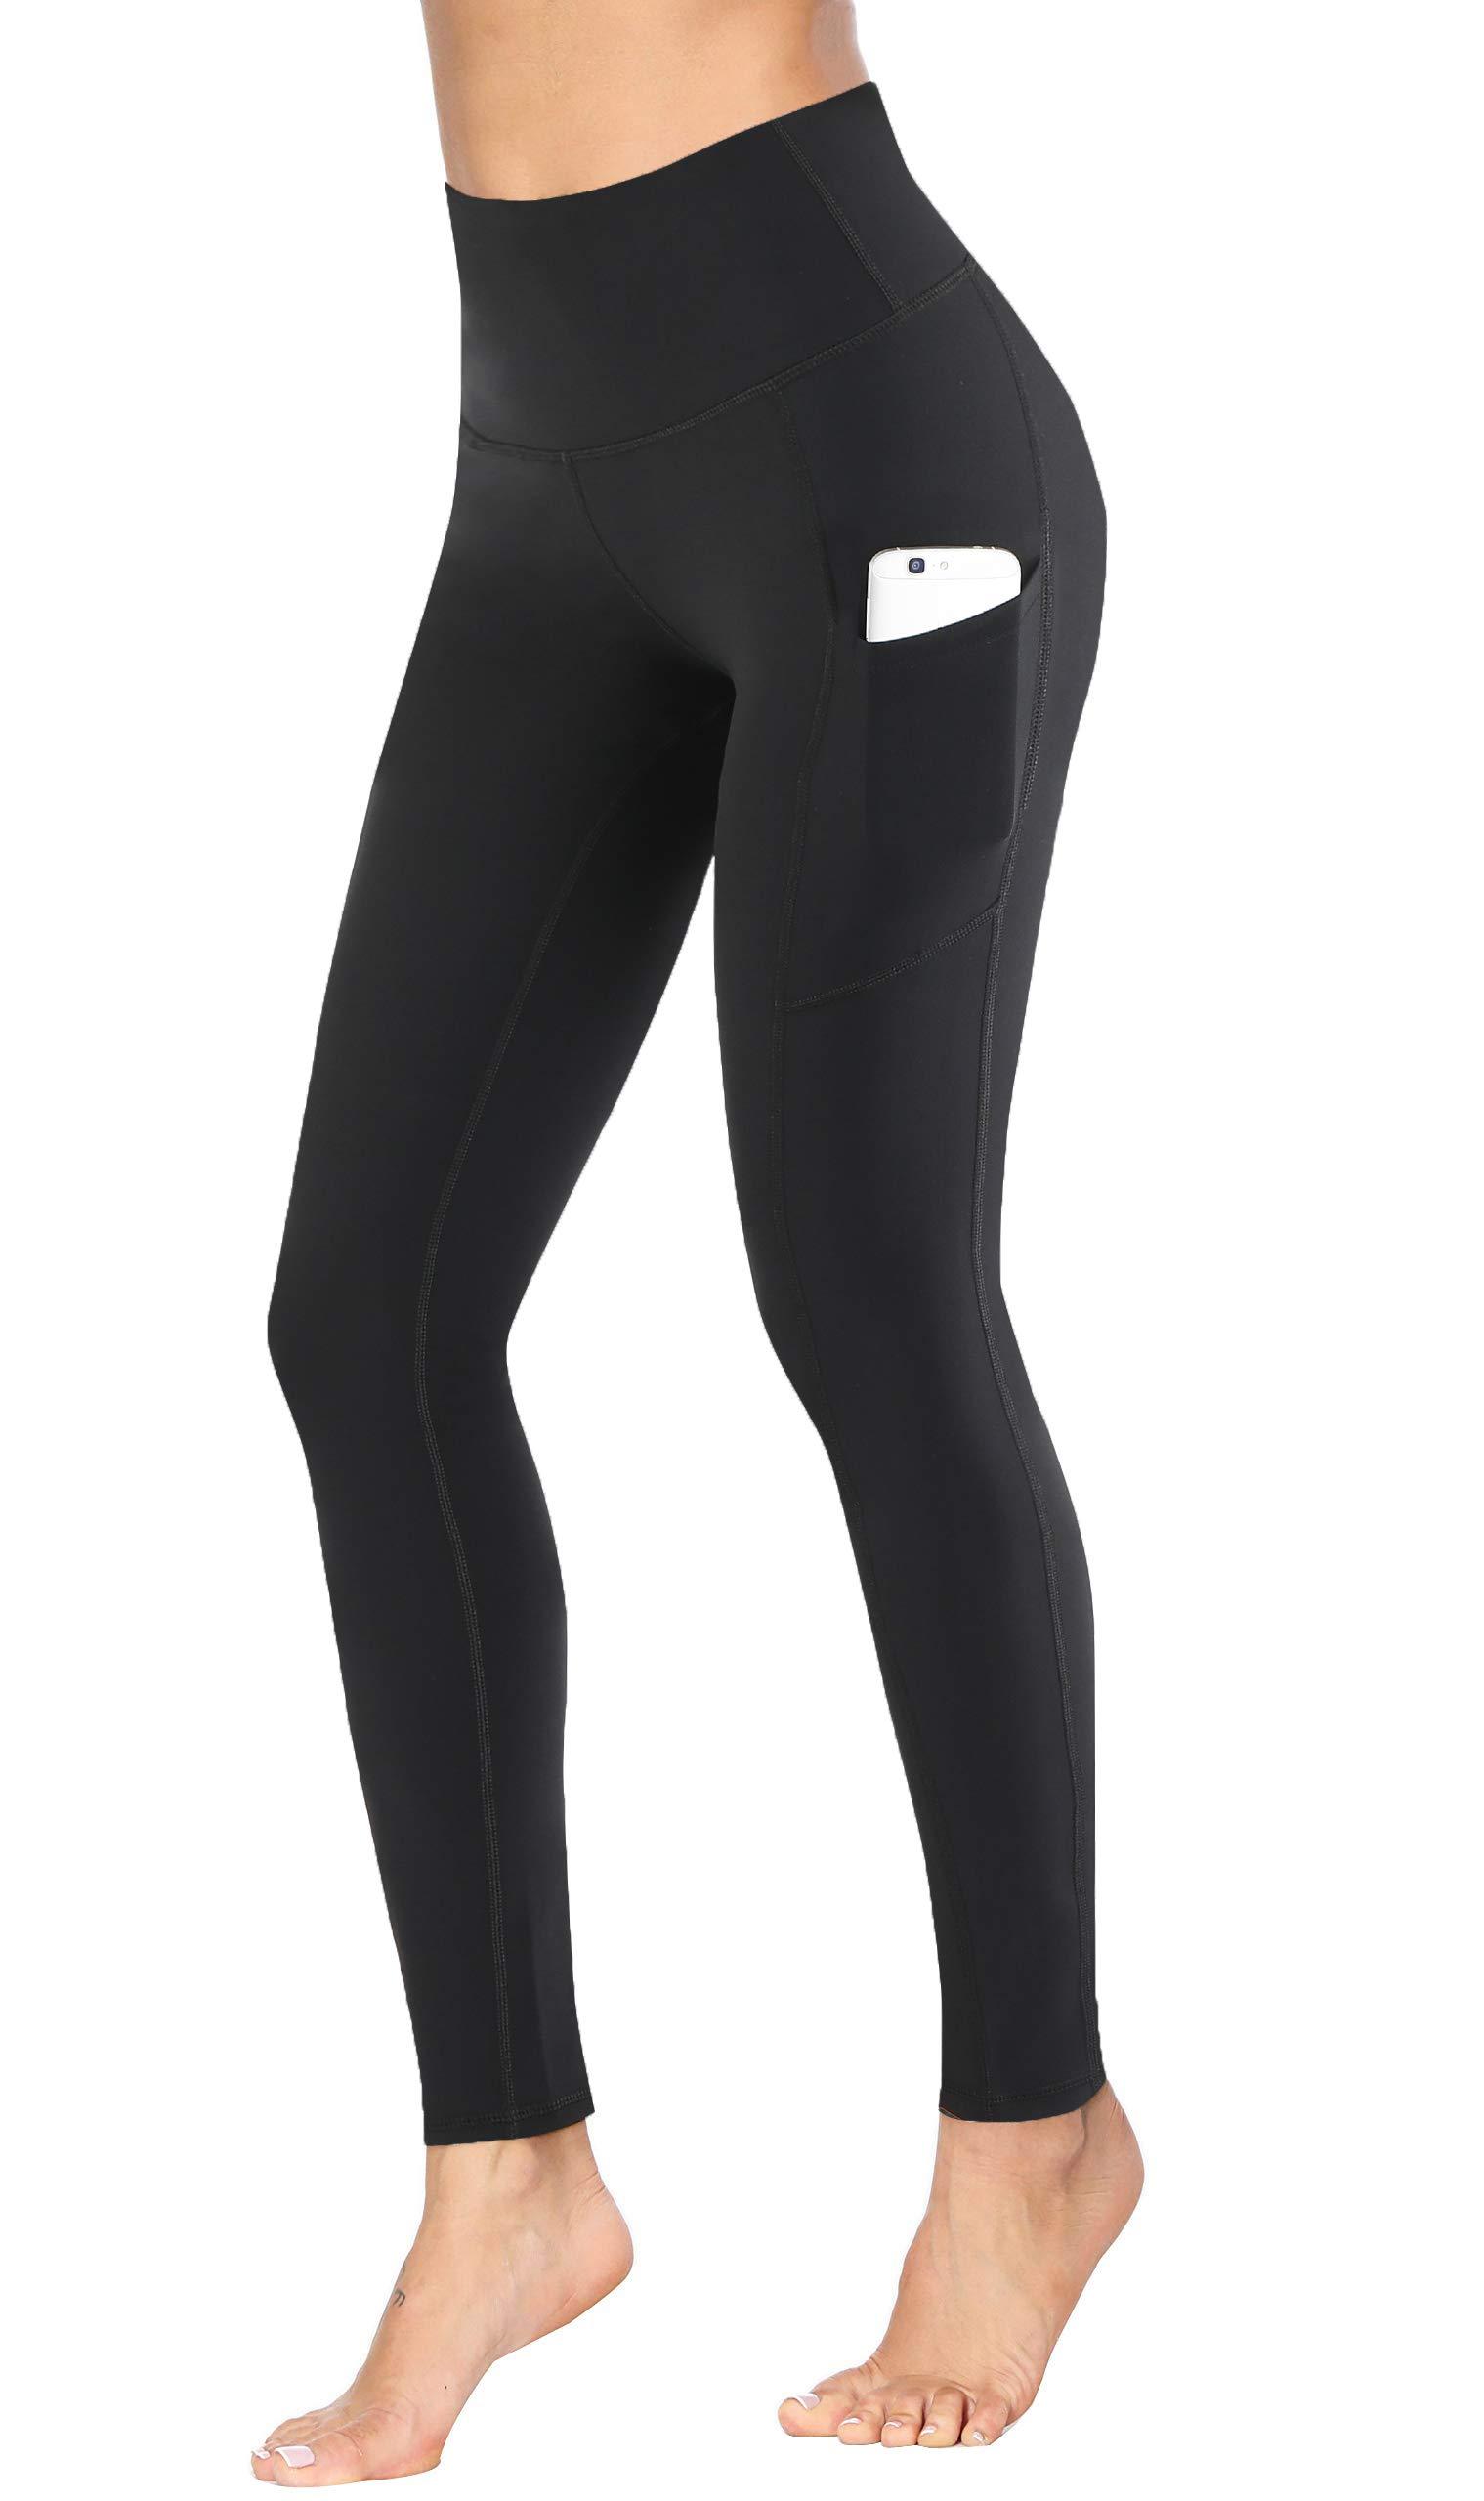 Fengbay High Waist Yoga Pants, Pocket Yoga Pants Tummy Control Workout Running 4 Way Stretch Yoga Leggings Leggings Black by Fengbay